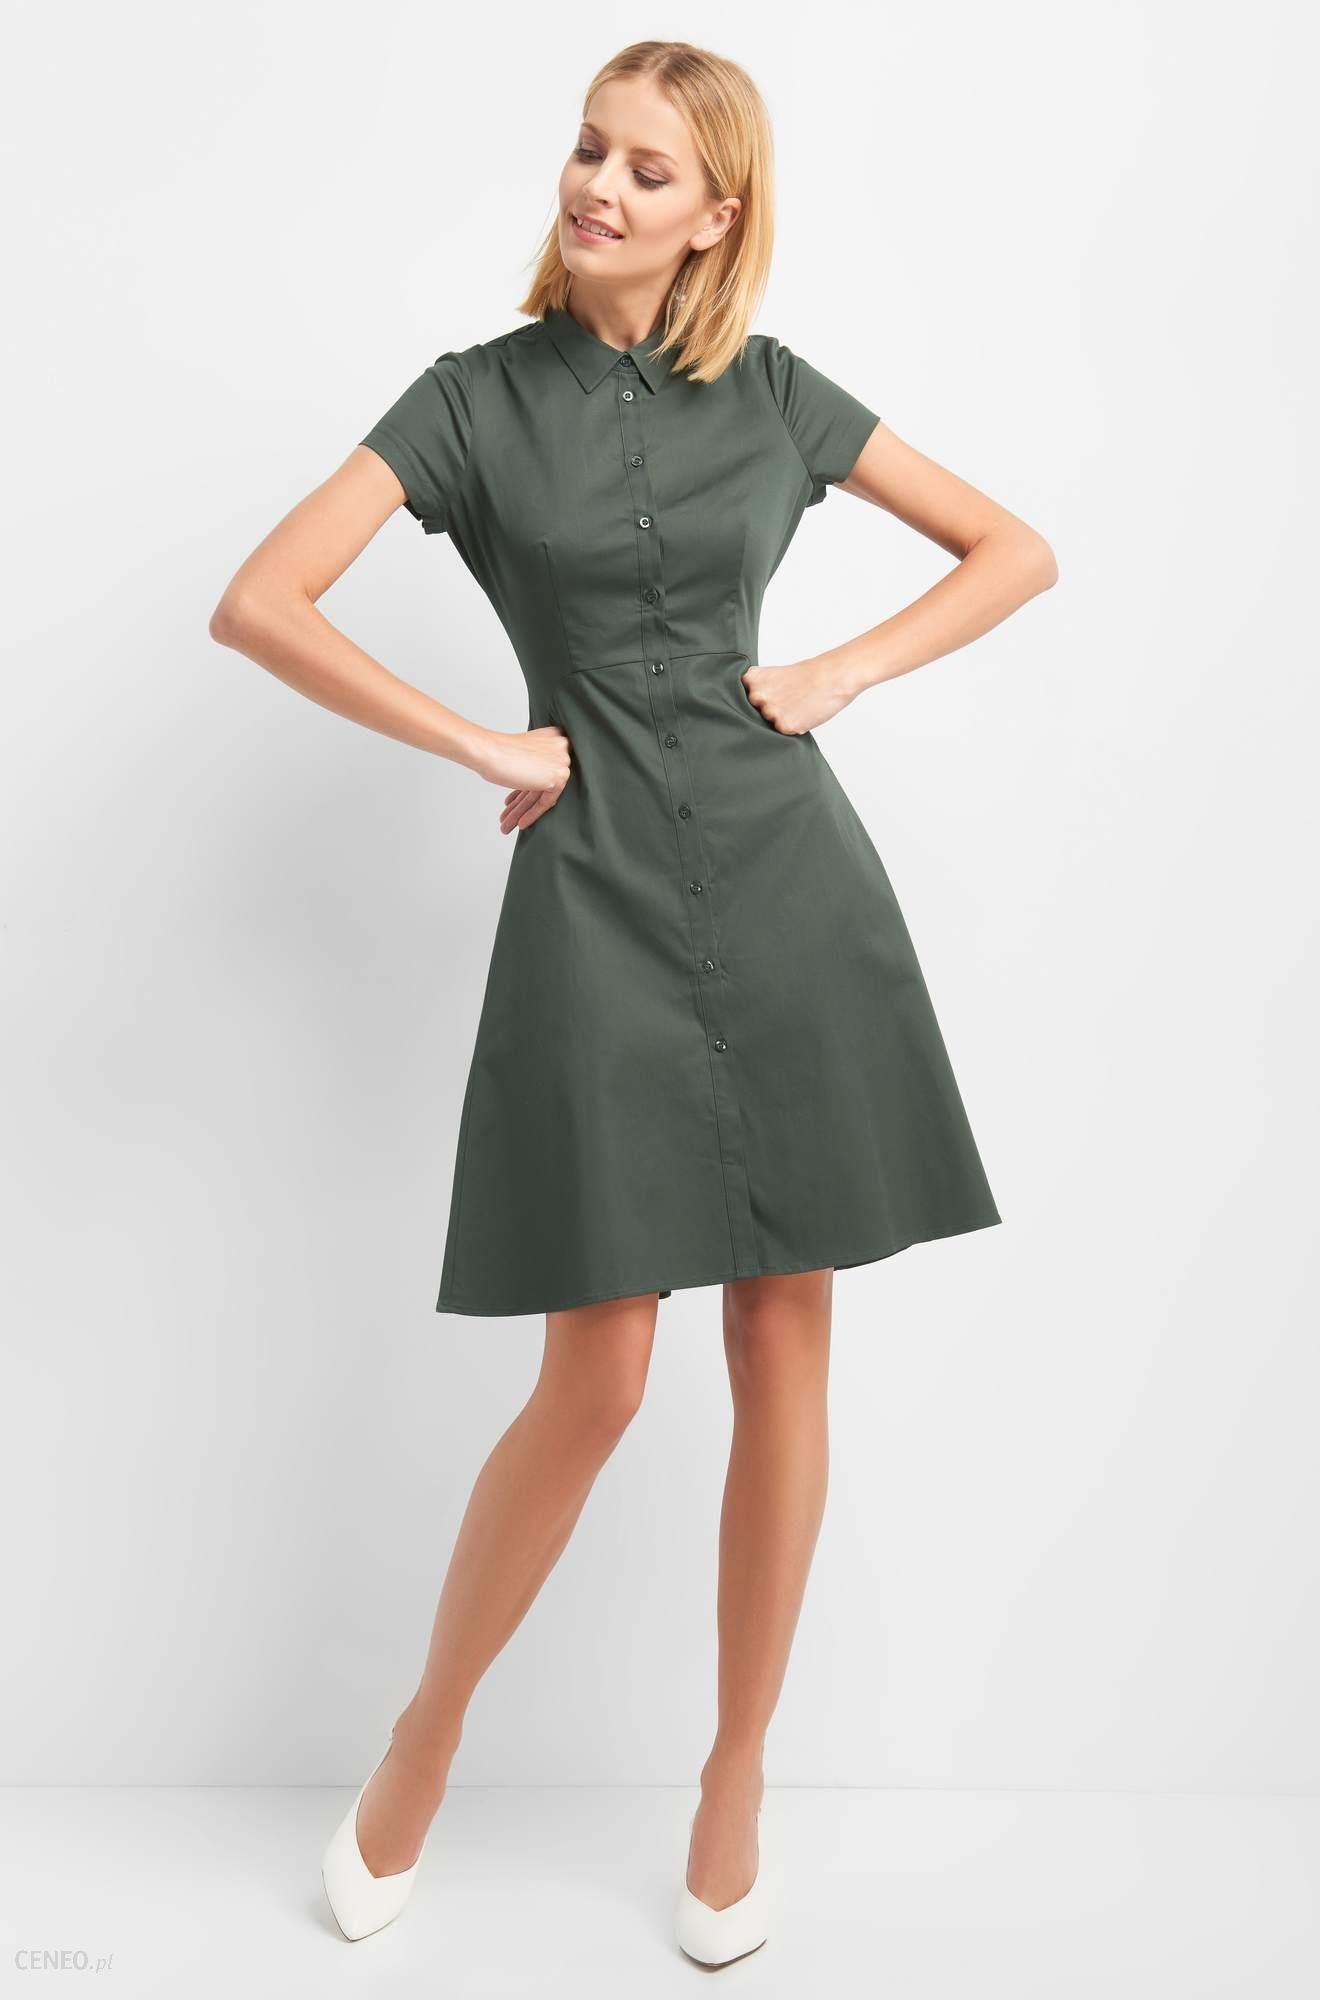 94b794255401 ORSAY Rozkloszowana sukienka - Ceny i opinie - Ceneo.pl